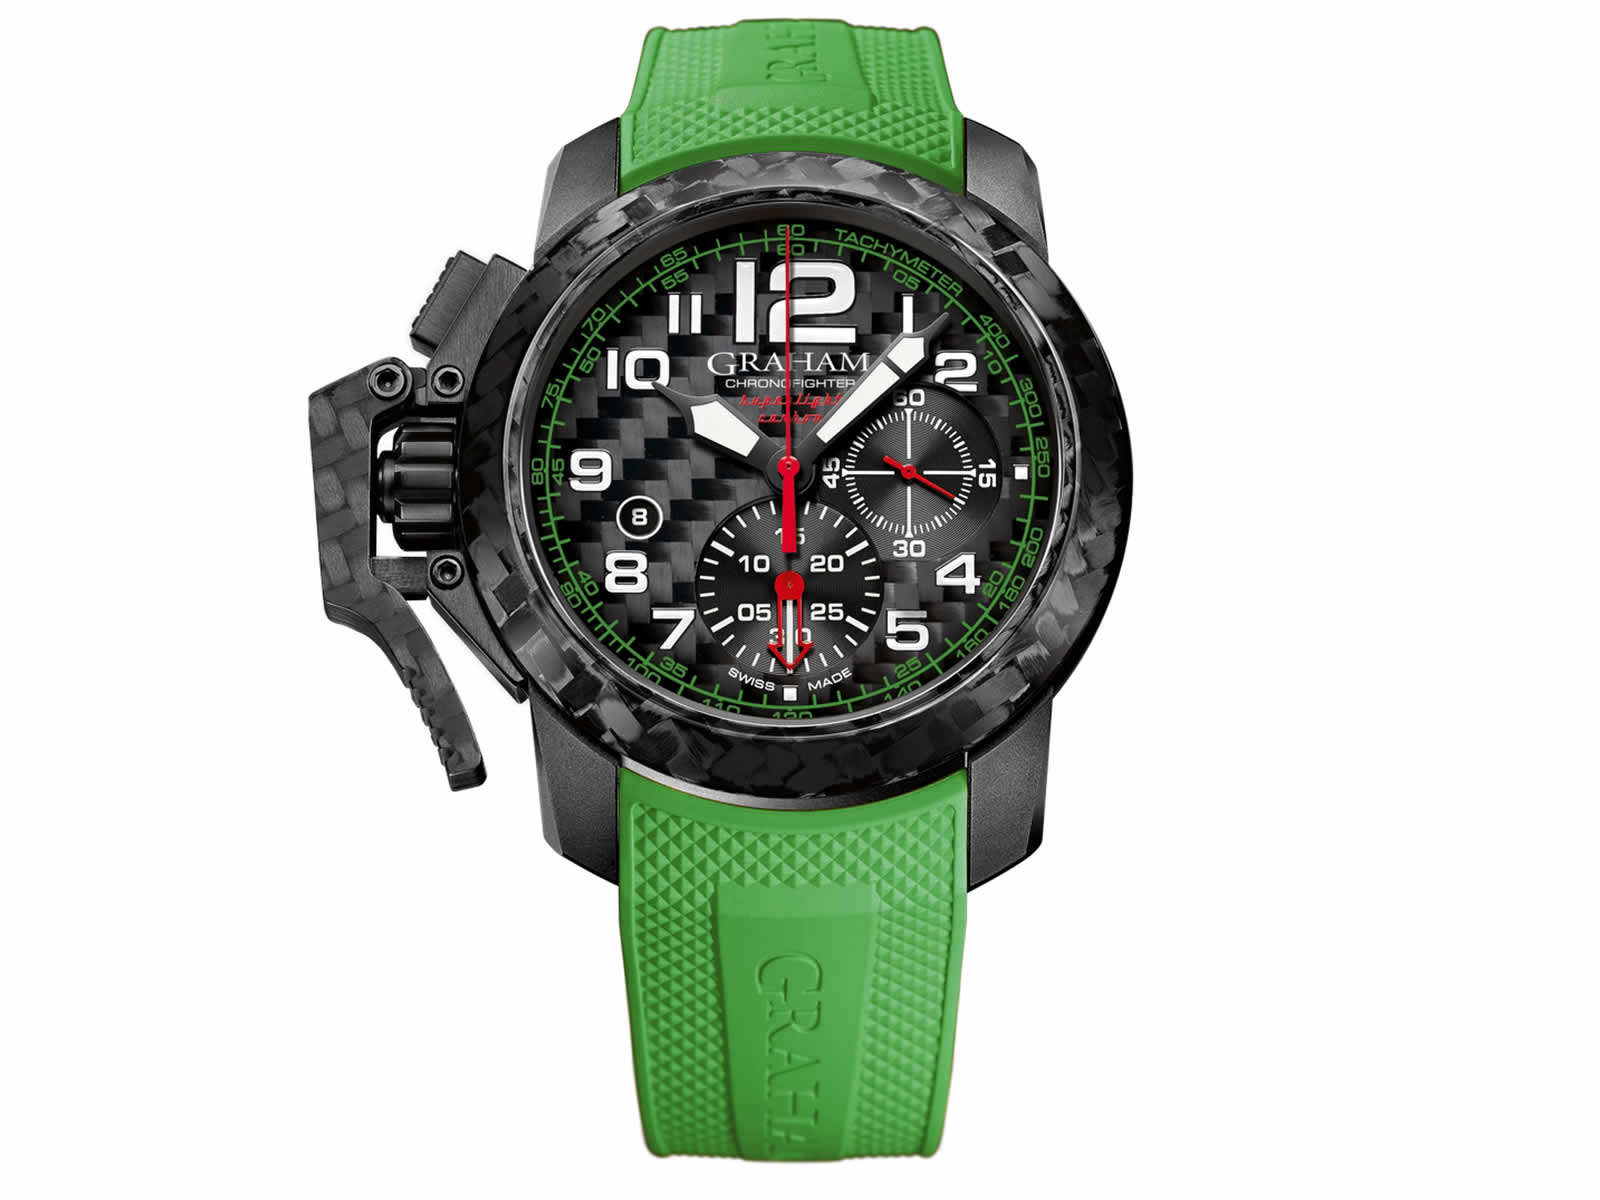 2ccbk-g06a-graham-chronofighter-superlight-karbon gerçek renk-.jpg